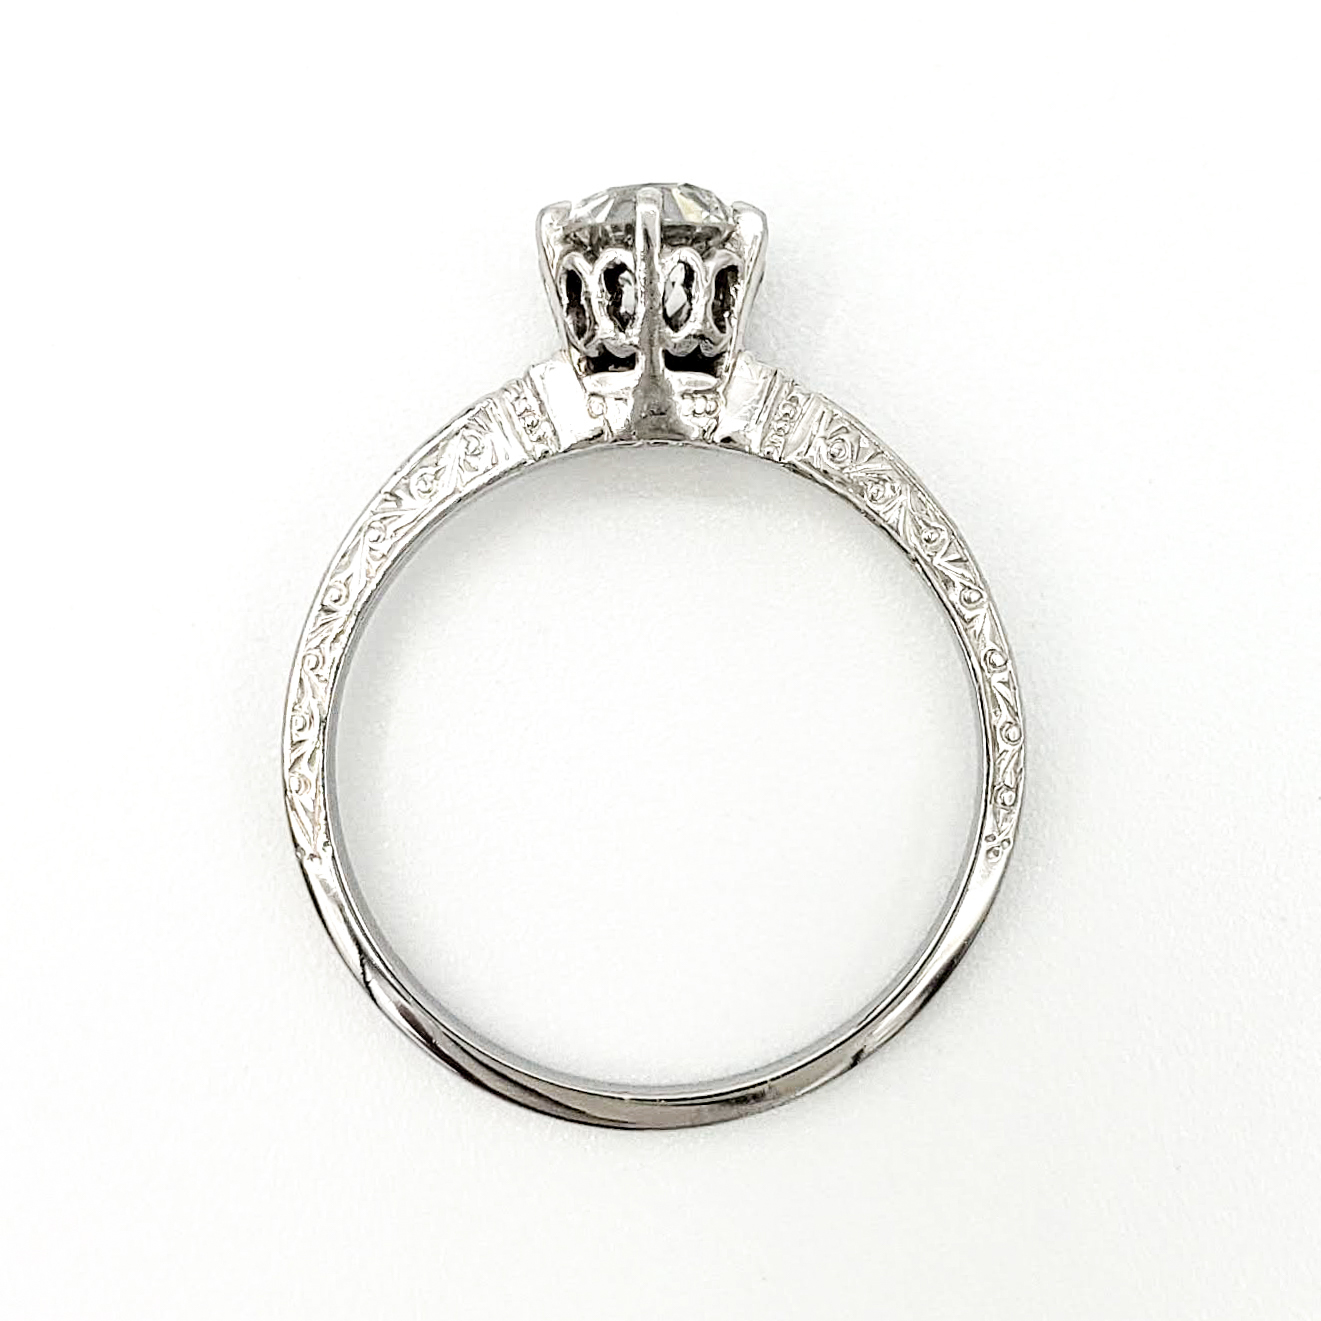 vintage-platinum-engagement-ring-with-0-63-carat-old-european-cut-diamond-egl-e-vs1